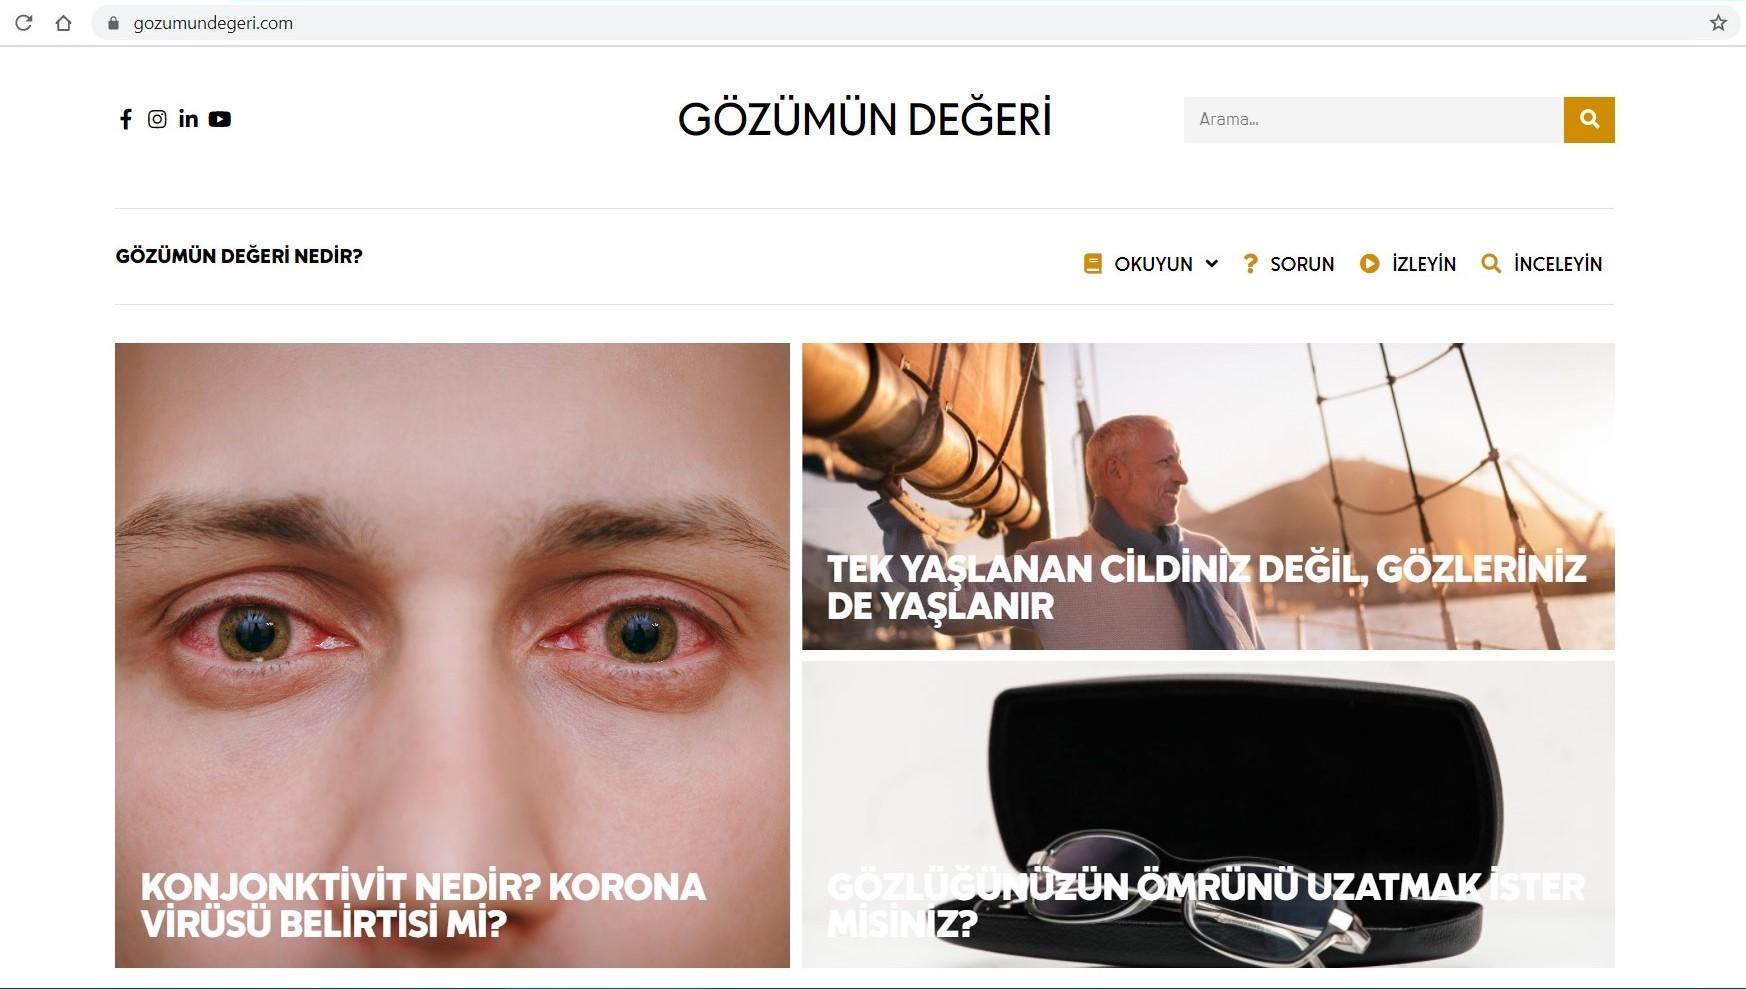 Gozumundegeri-com